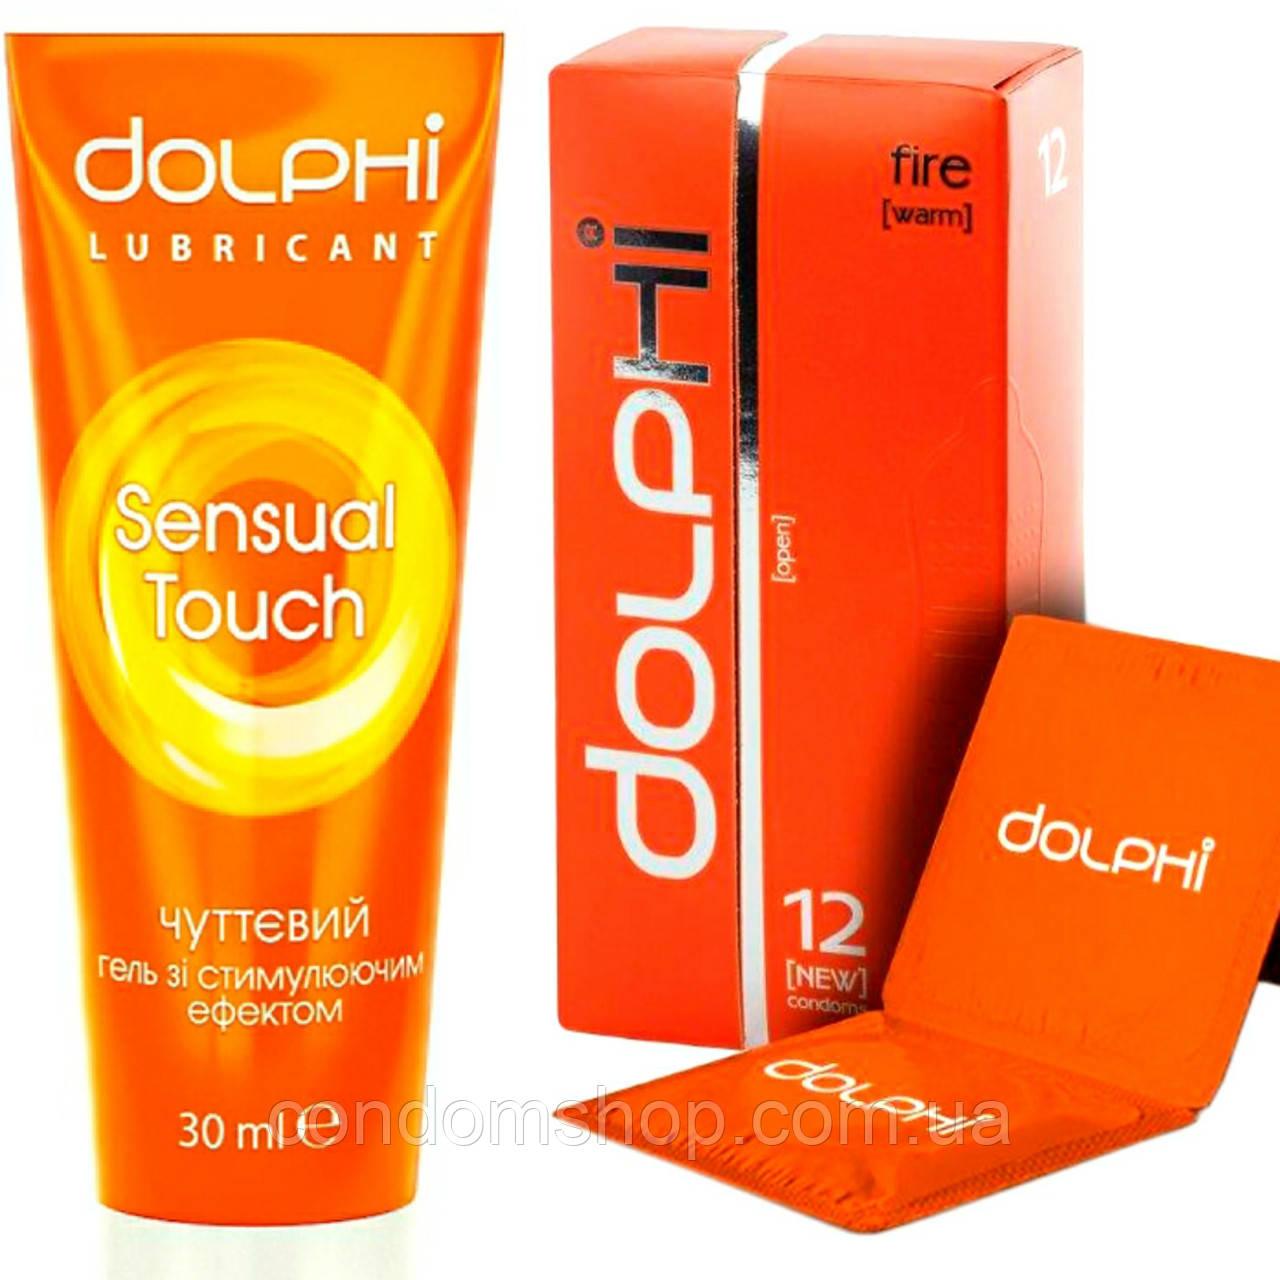 "Набор Dolphi luxe ,,Пламя страсти"":презервативы Dolphi Fire +гель-смазка Sensual Touch"